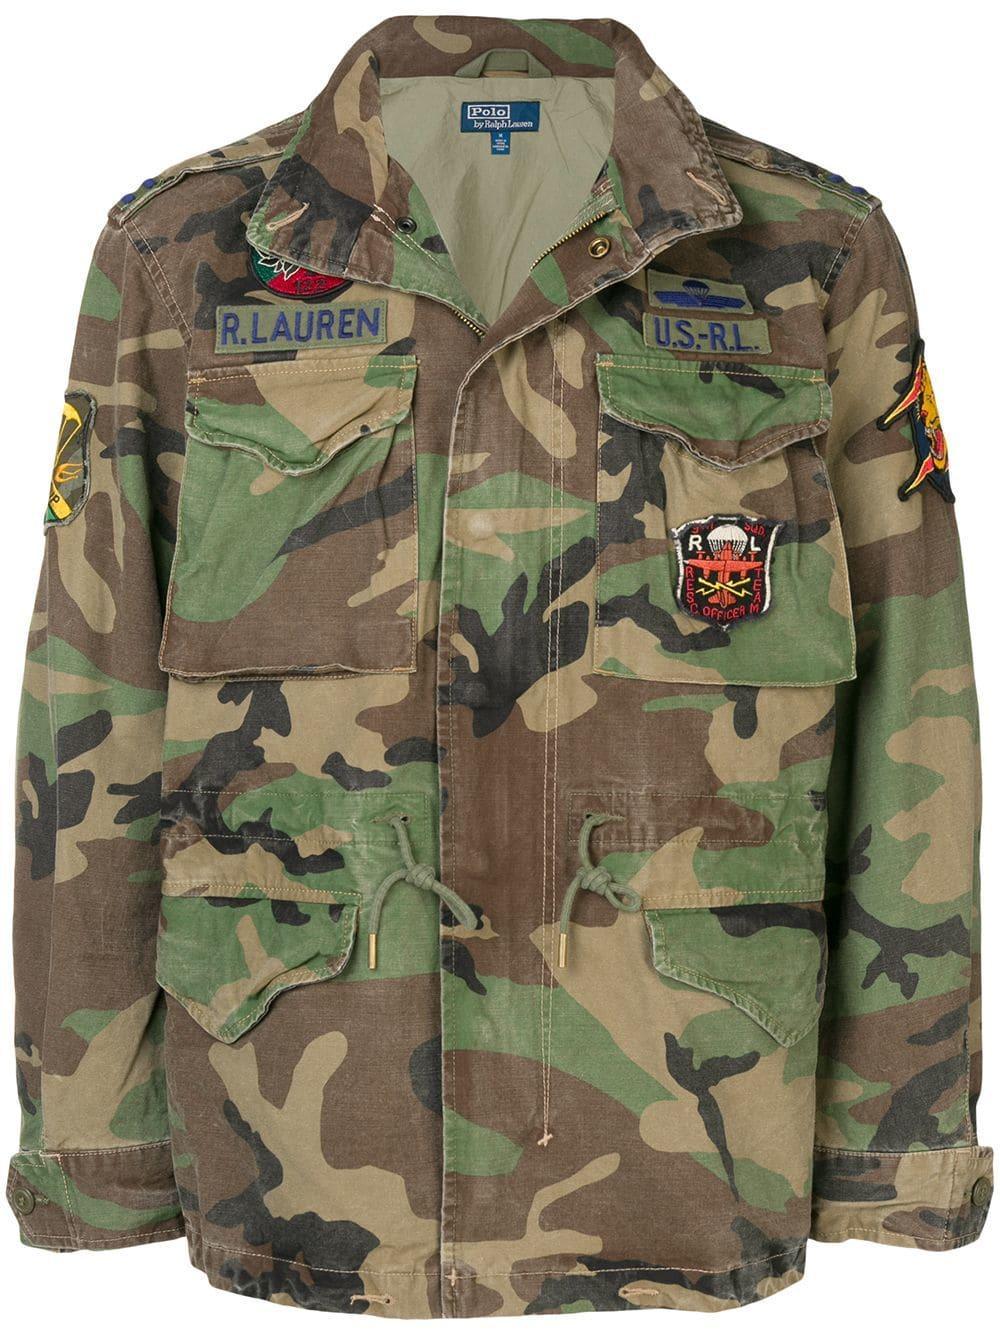 ff635880f8740 Polo Ralph Lauren Camouflage-Print Field Jacket In Green | ModeSens